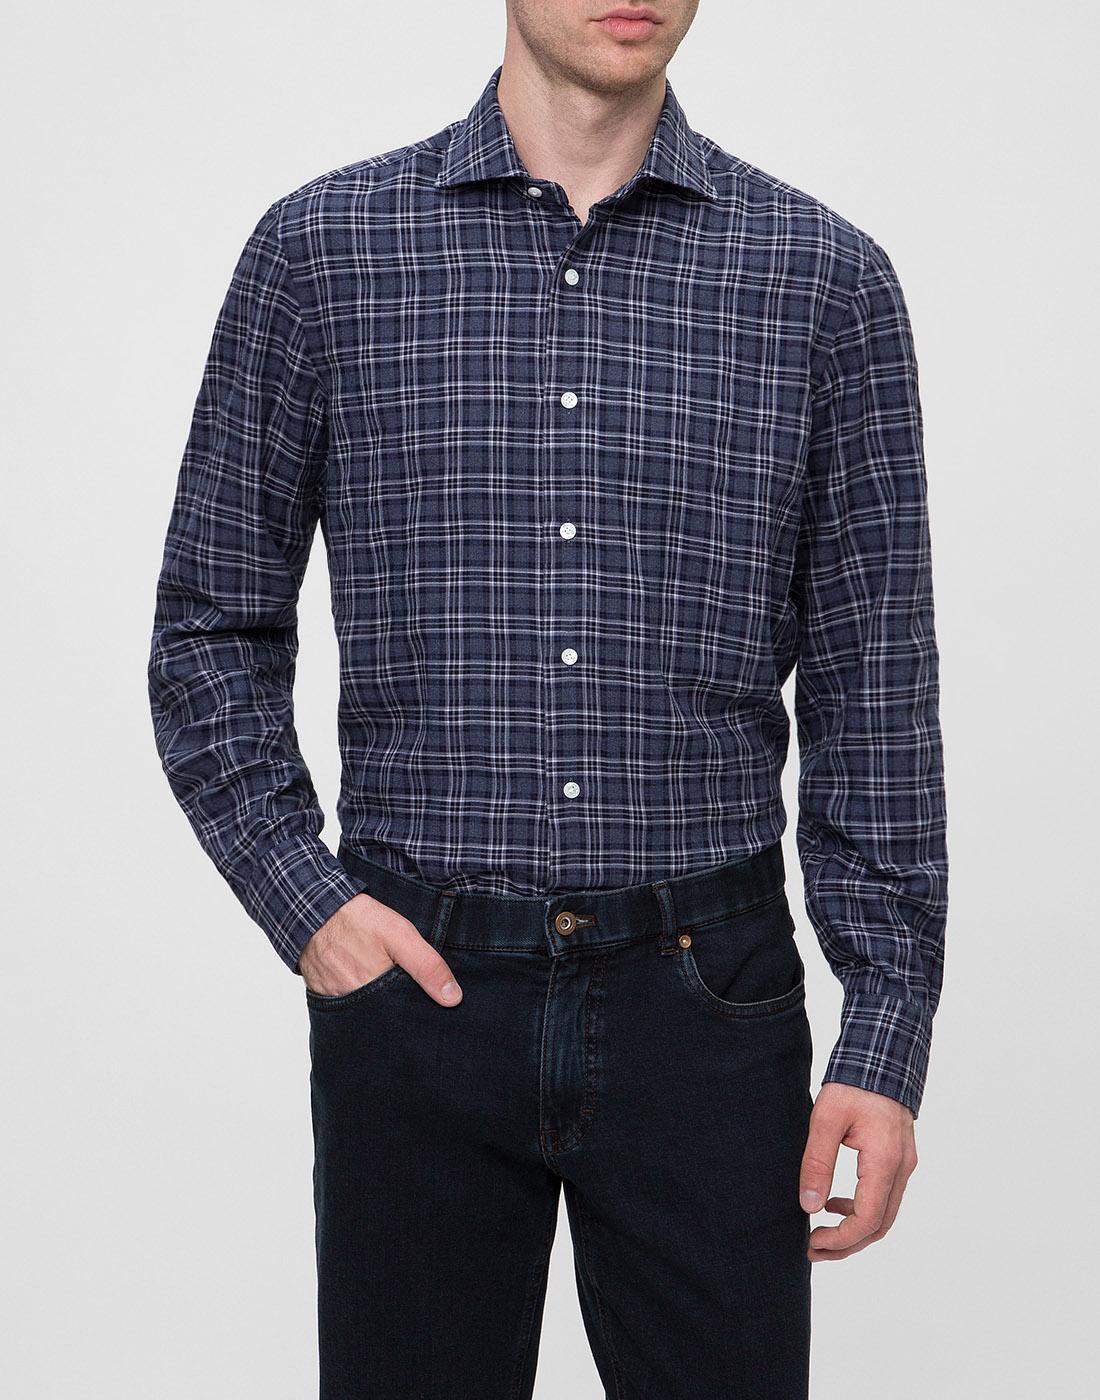 Мужская синяя рубашка в клетку Barba SD2U133603601X-2